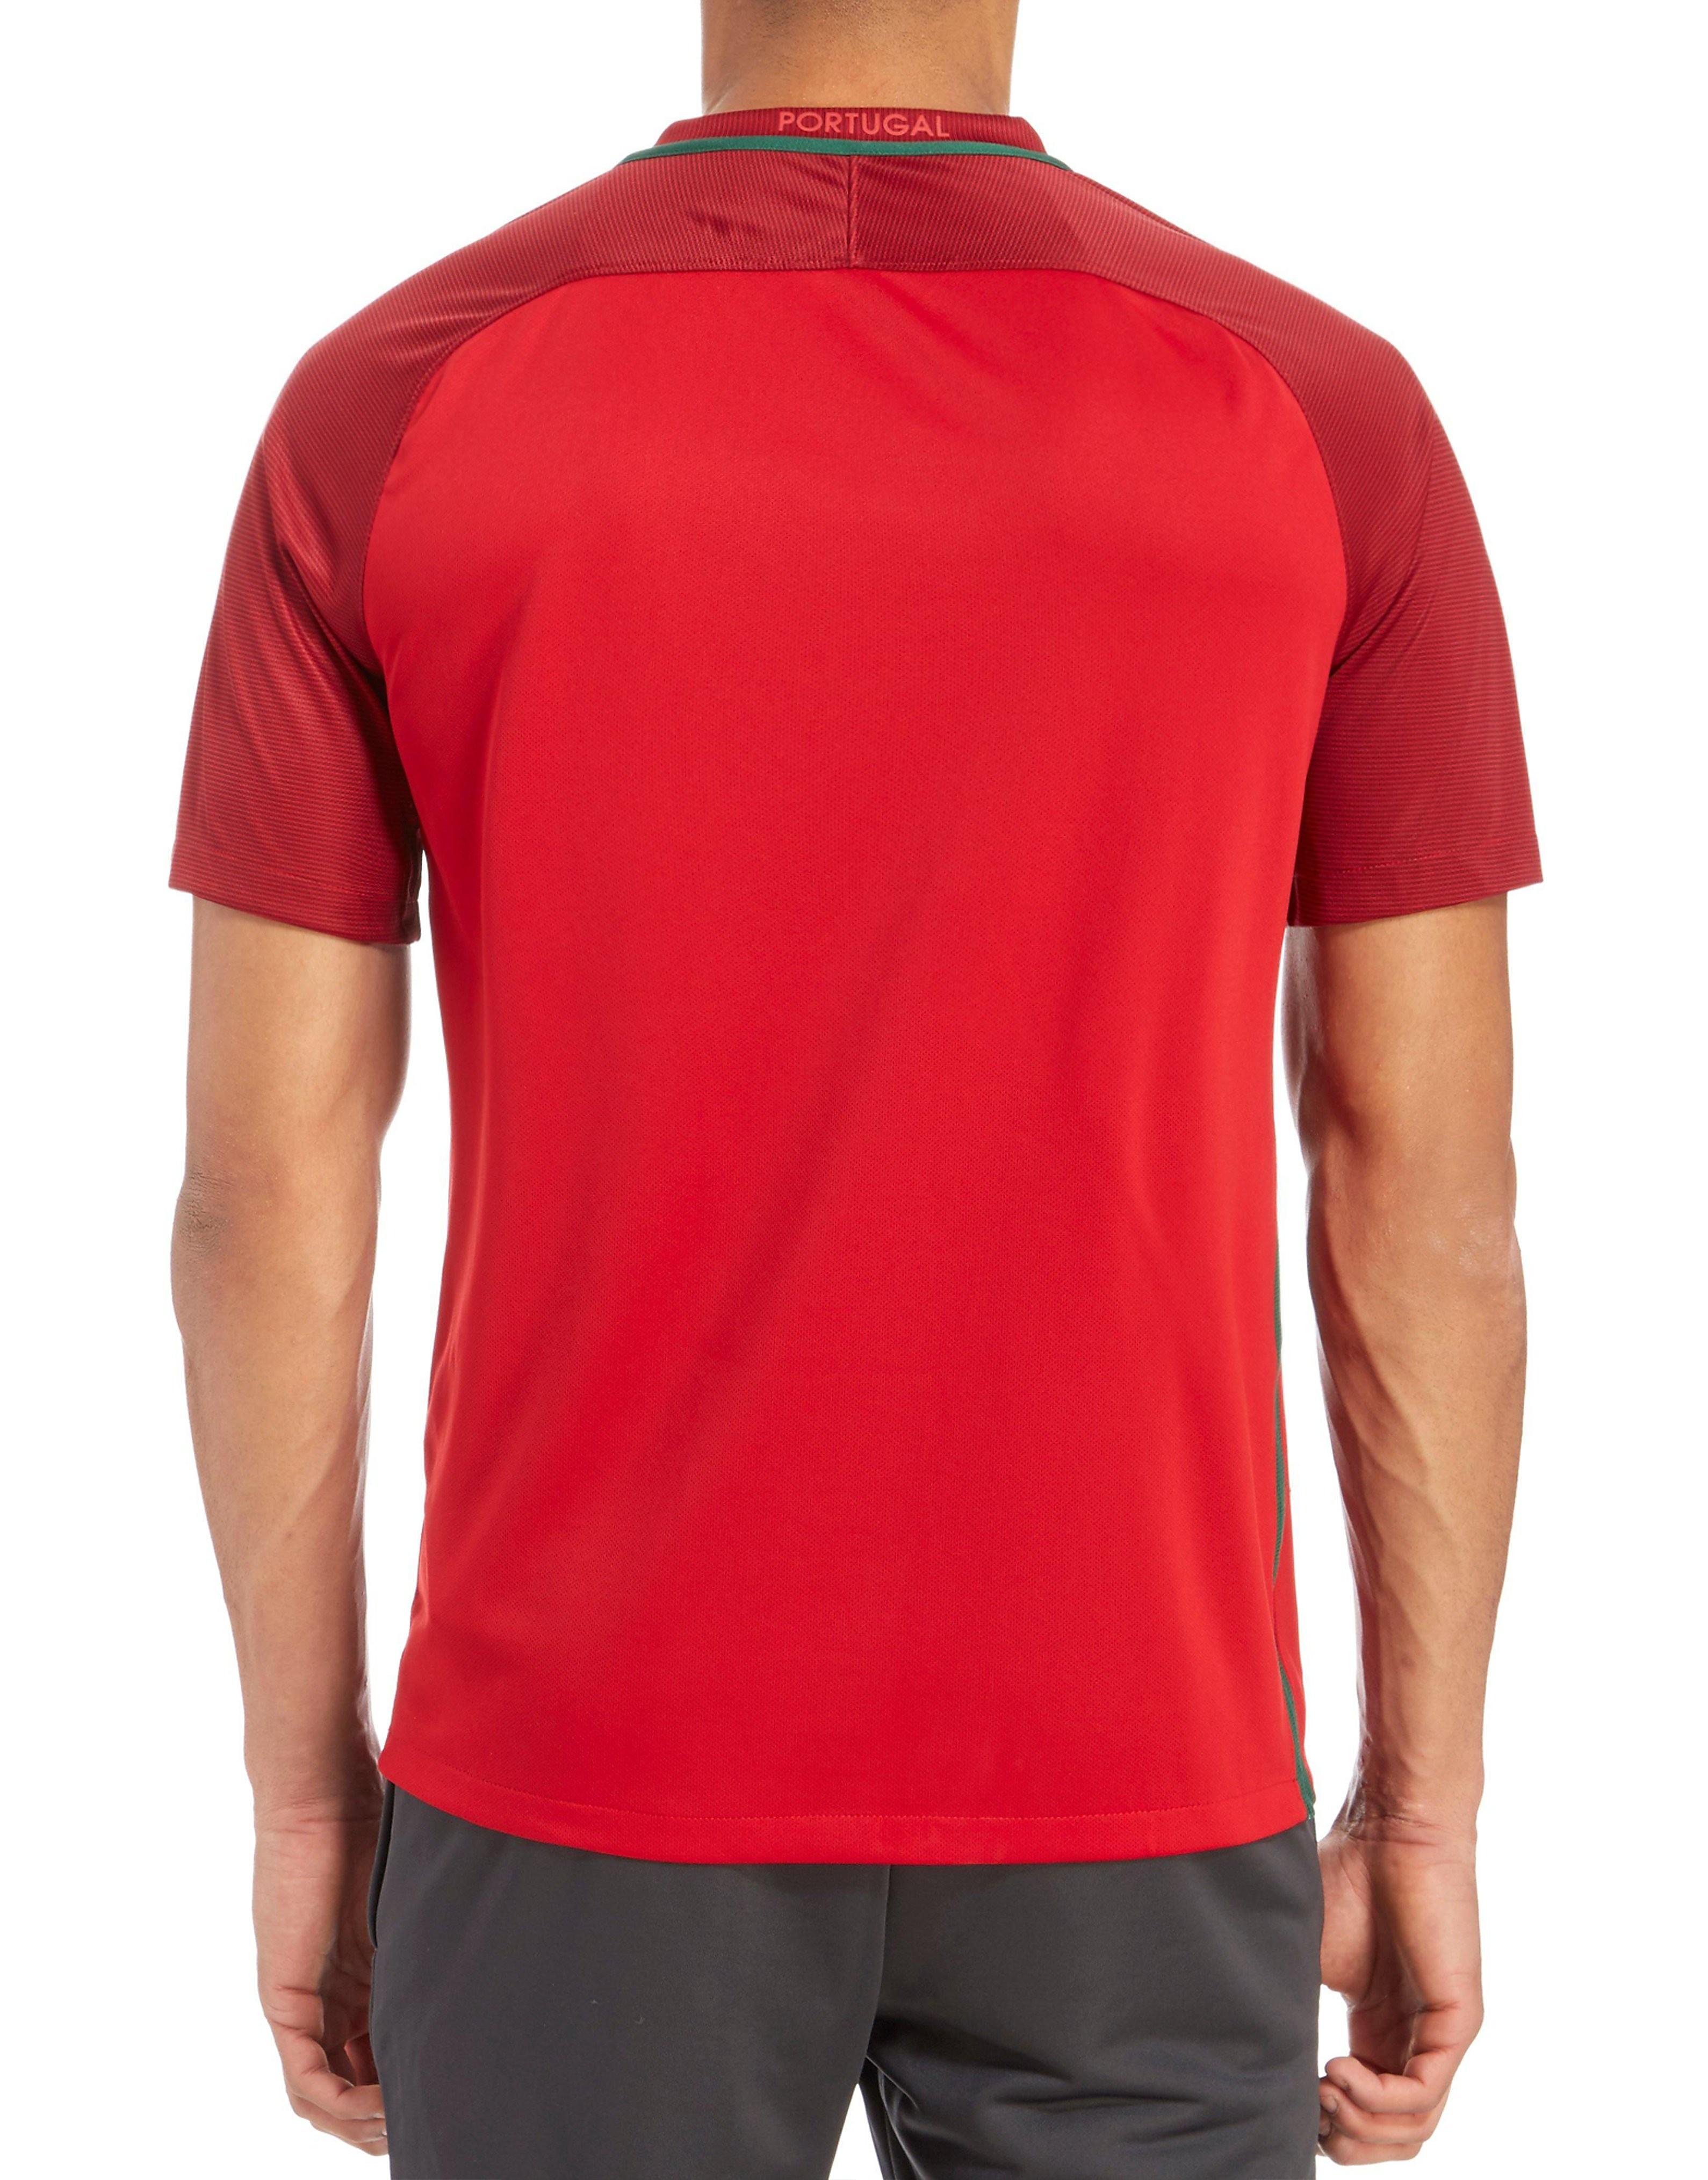 Nike Portugal Home 2016 Shirt